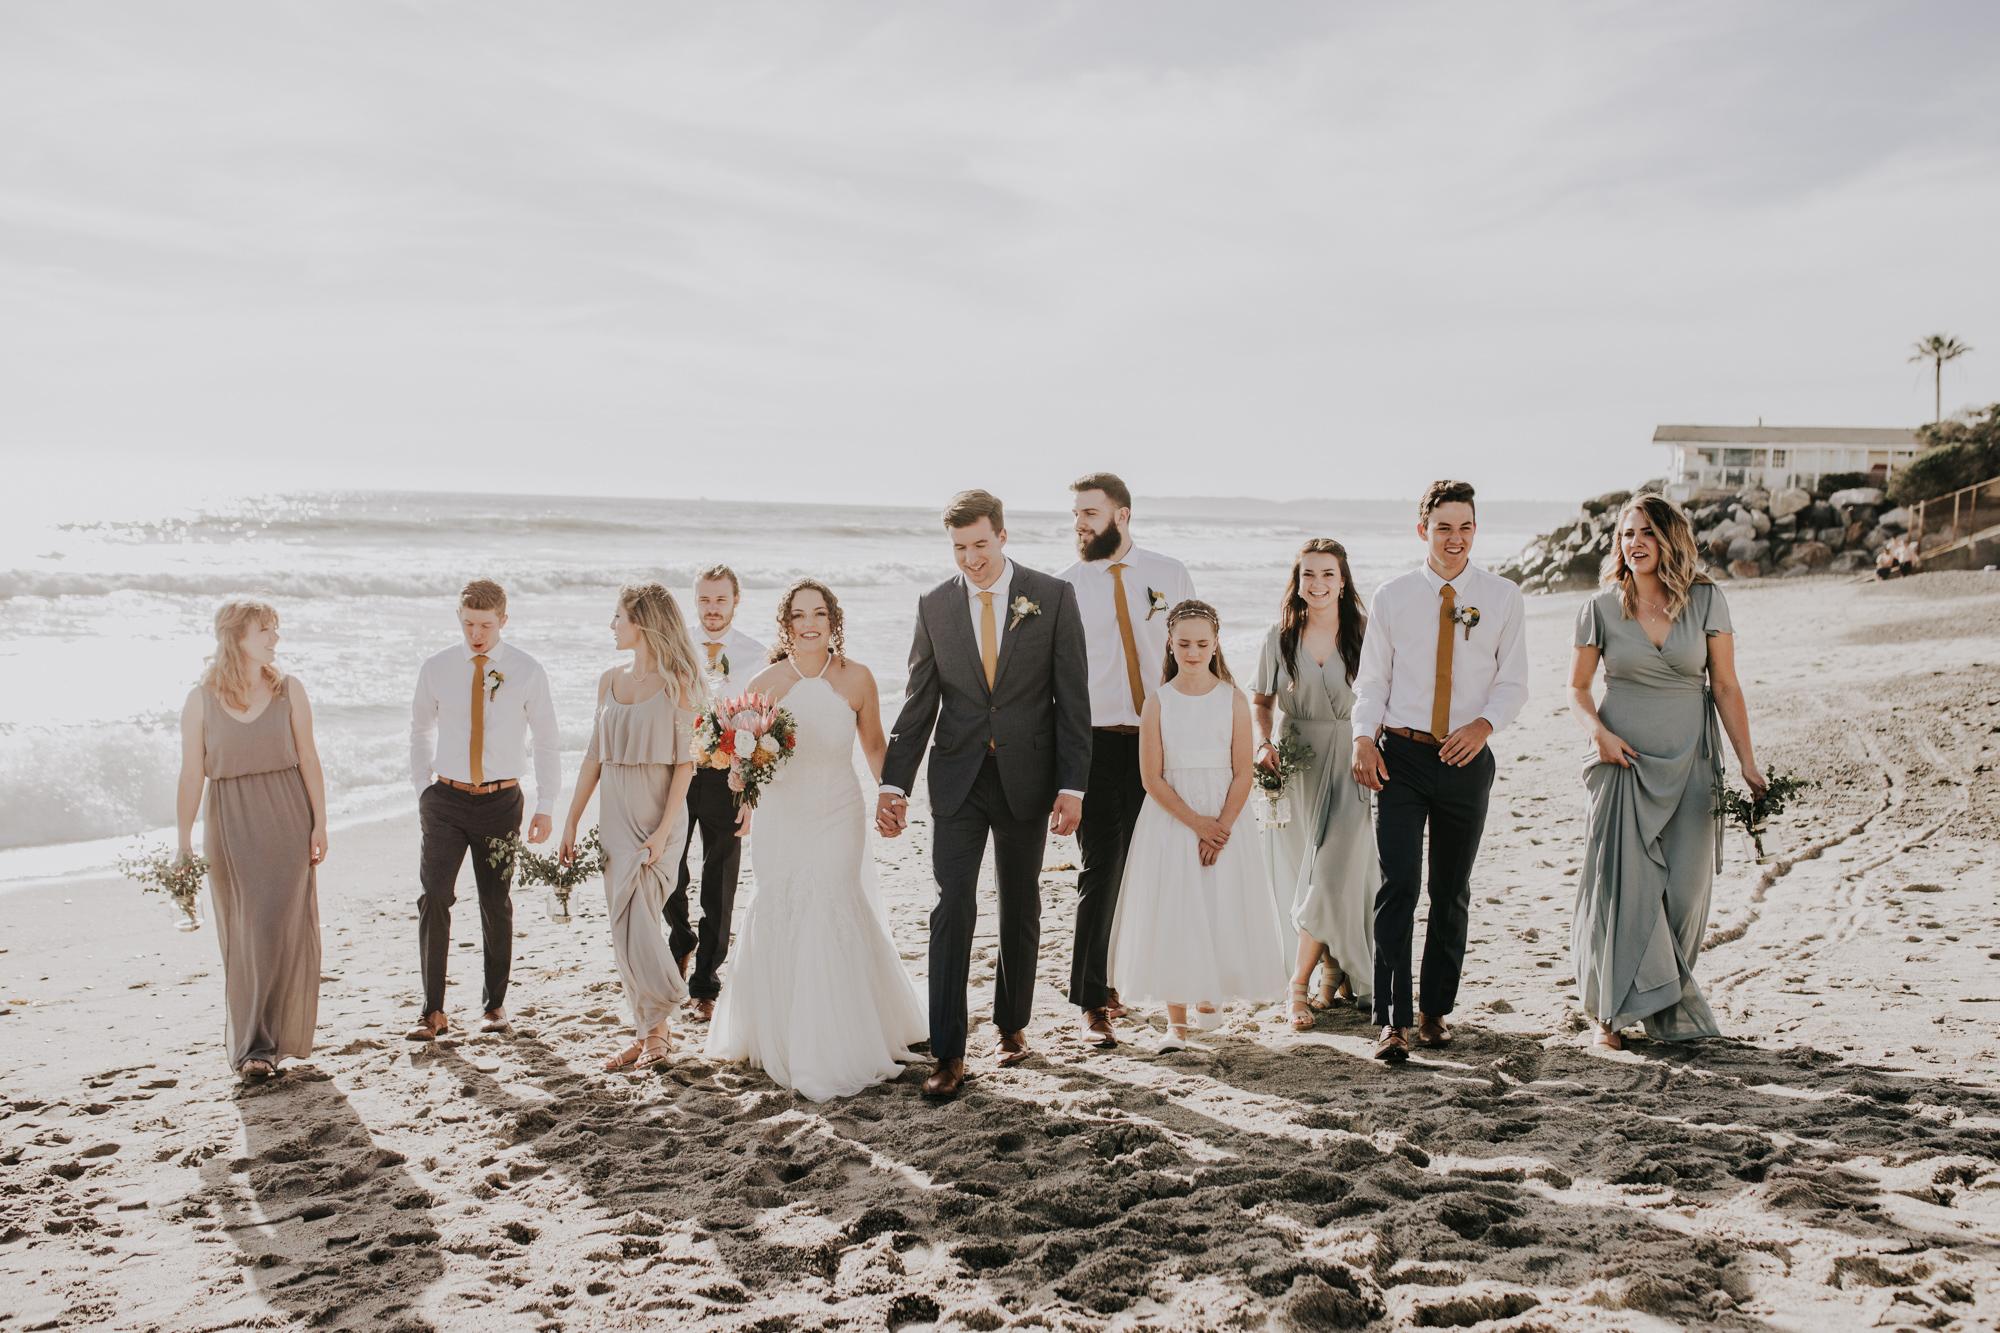 097-destination-wedding-san-clemente-california.jpg